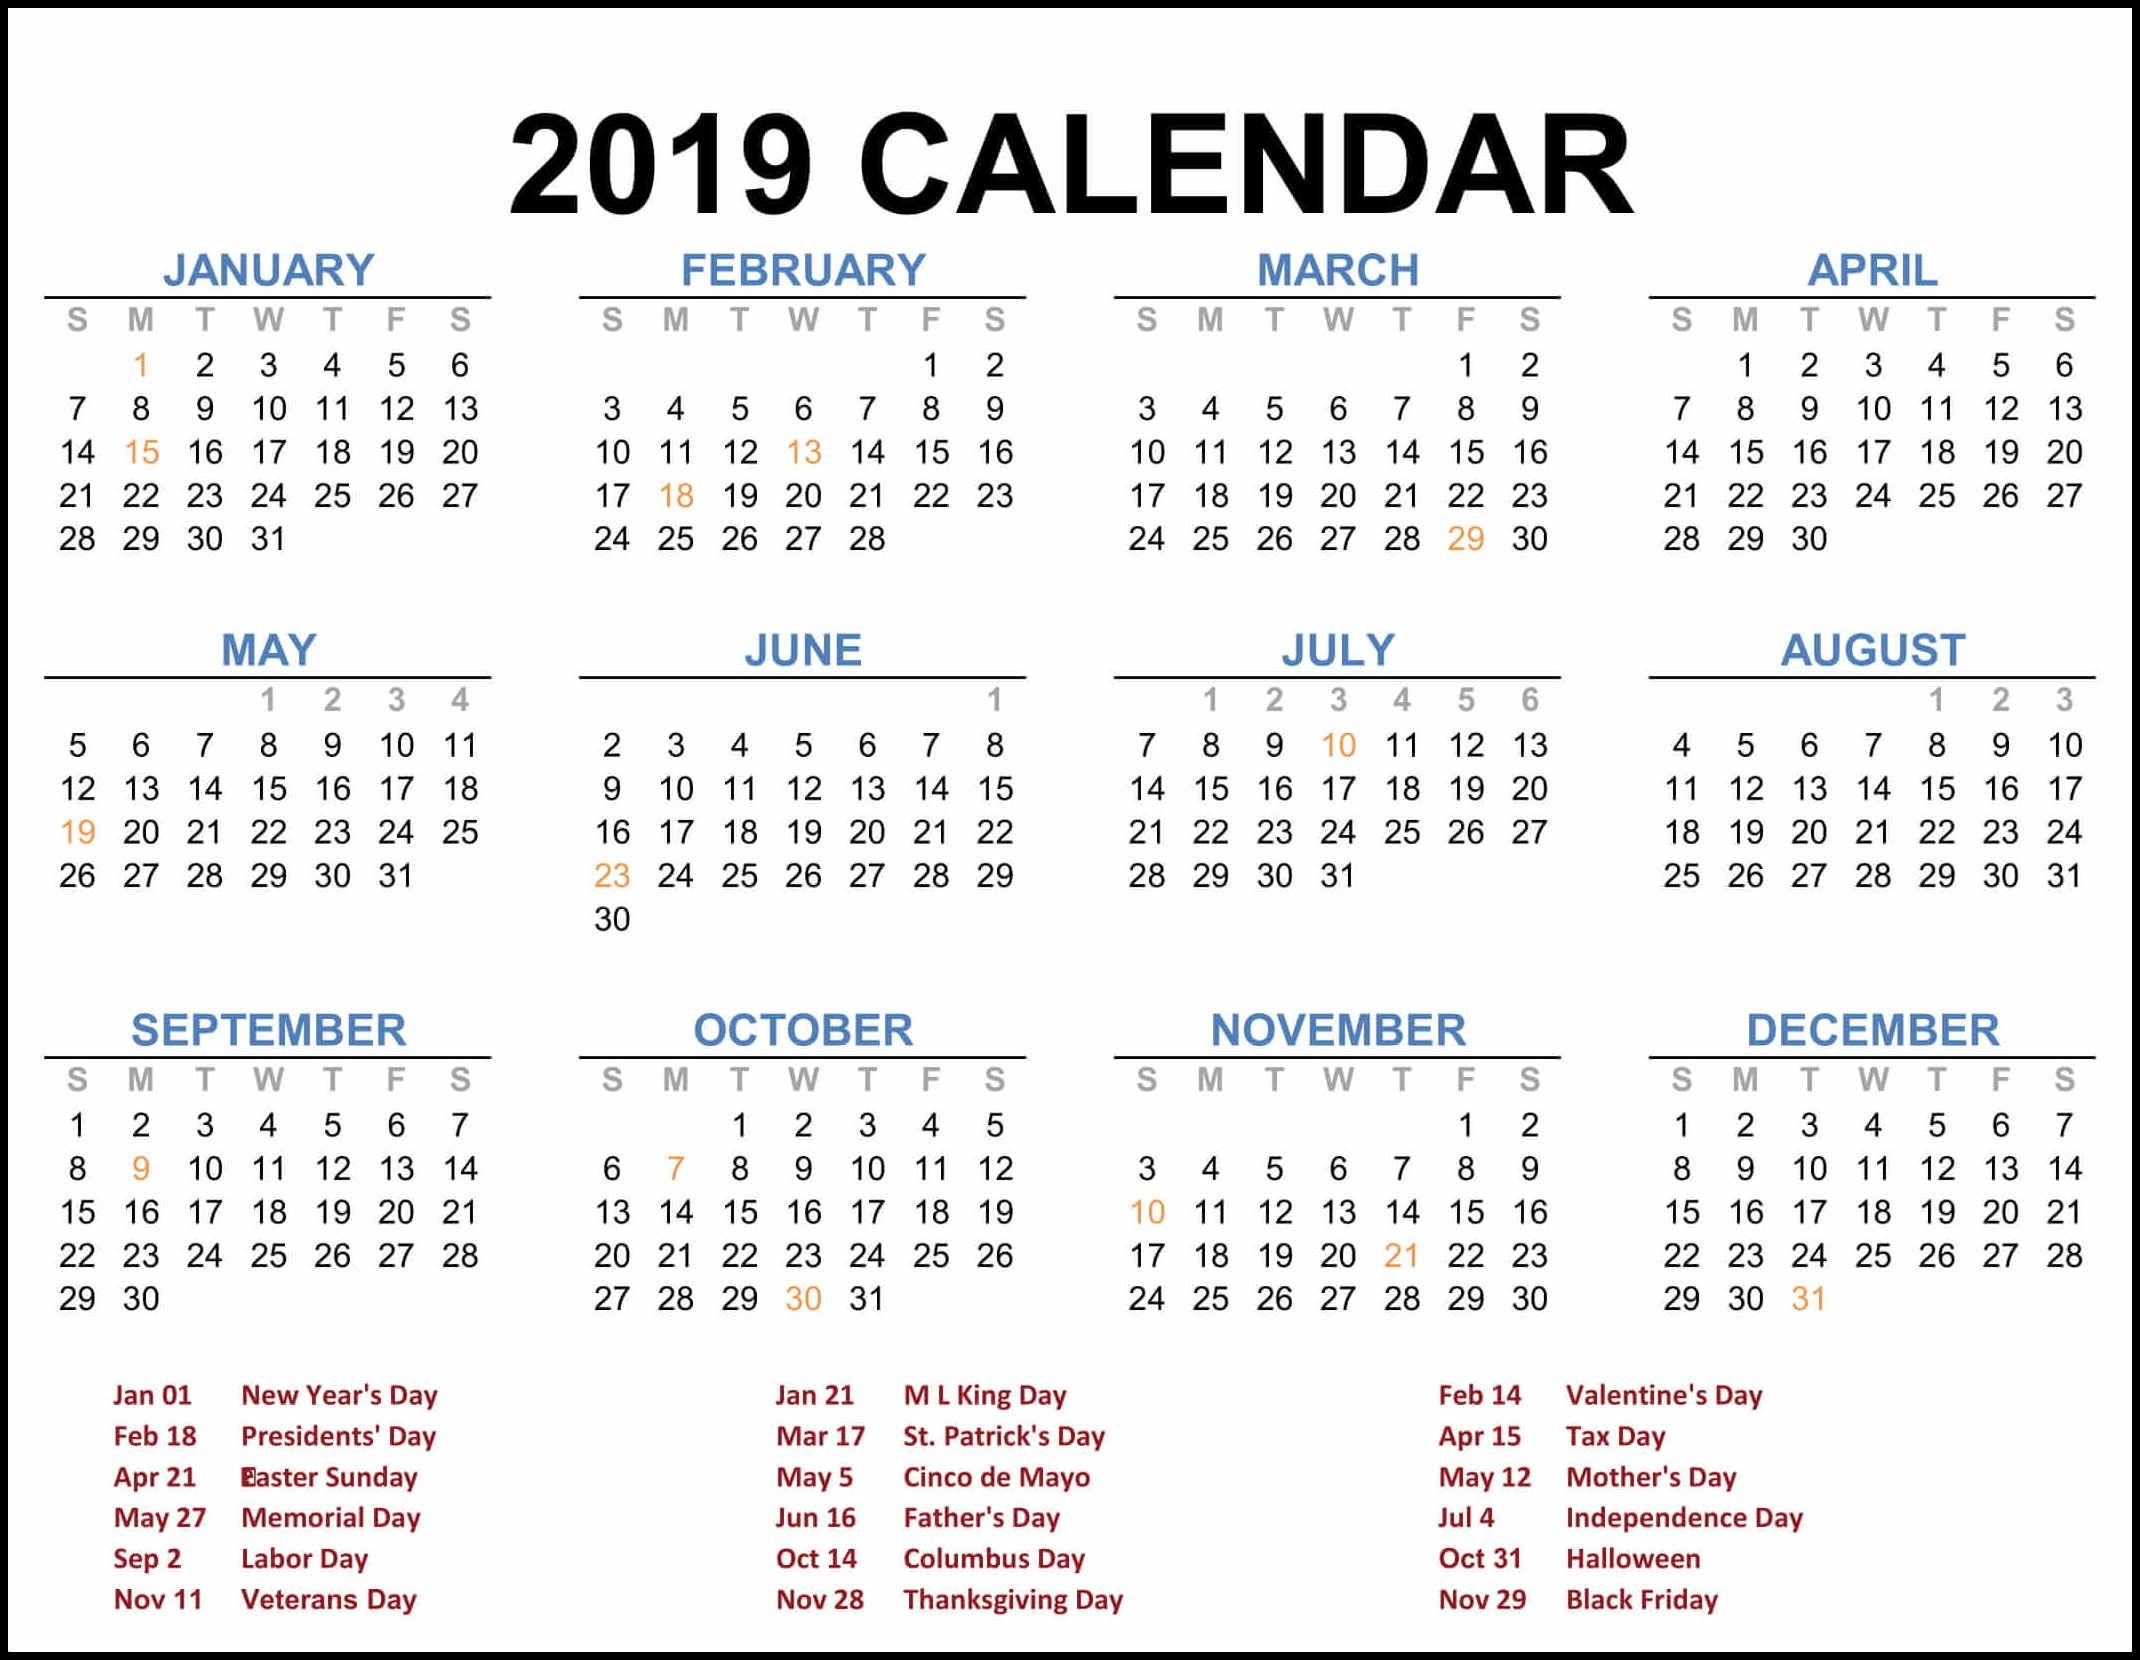 2019 Calendar Printable 12 Month Calendar on e Page